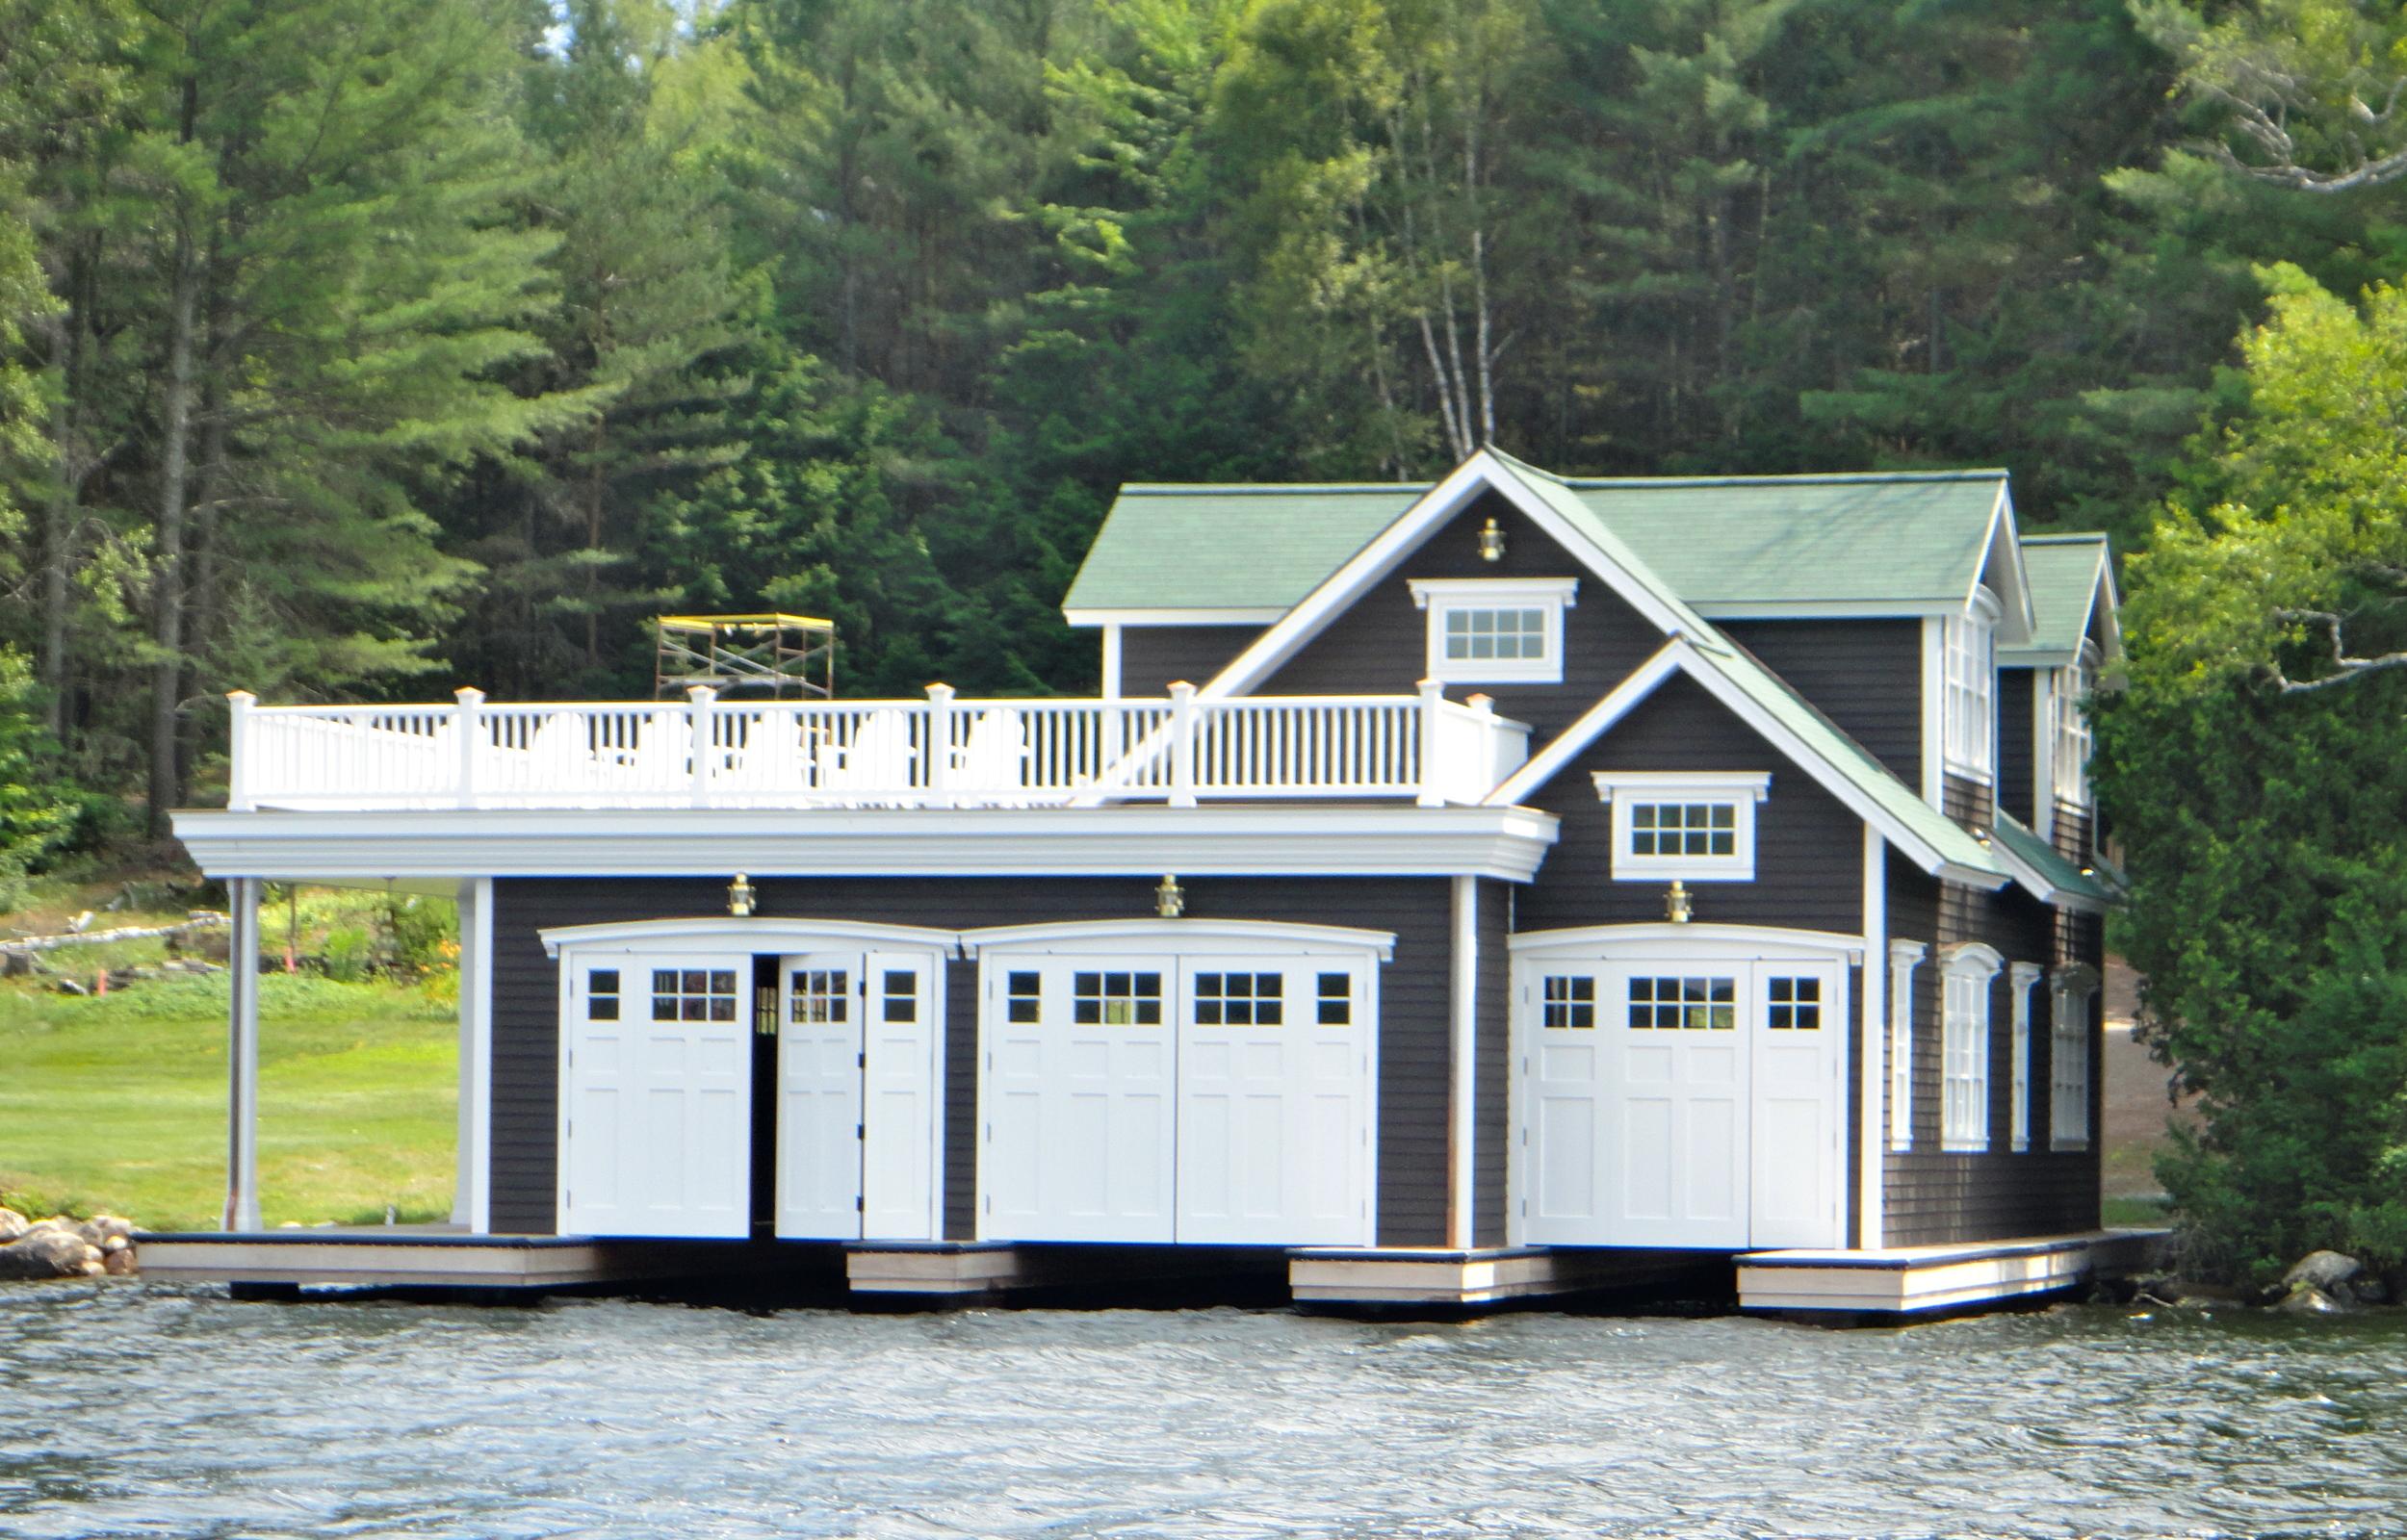 Typical boathouse on Lake Placid